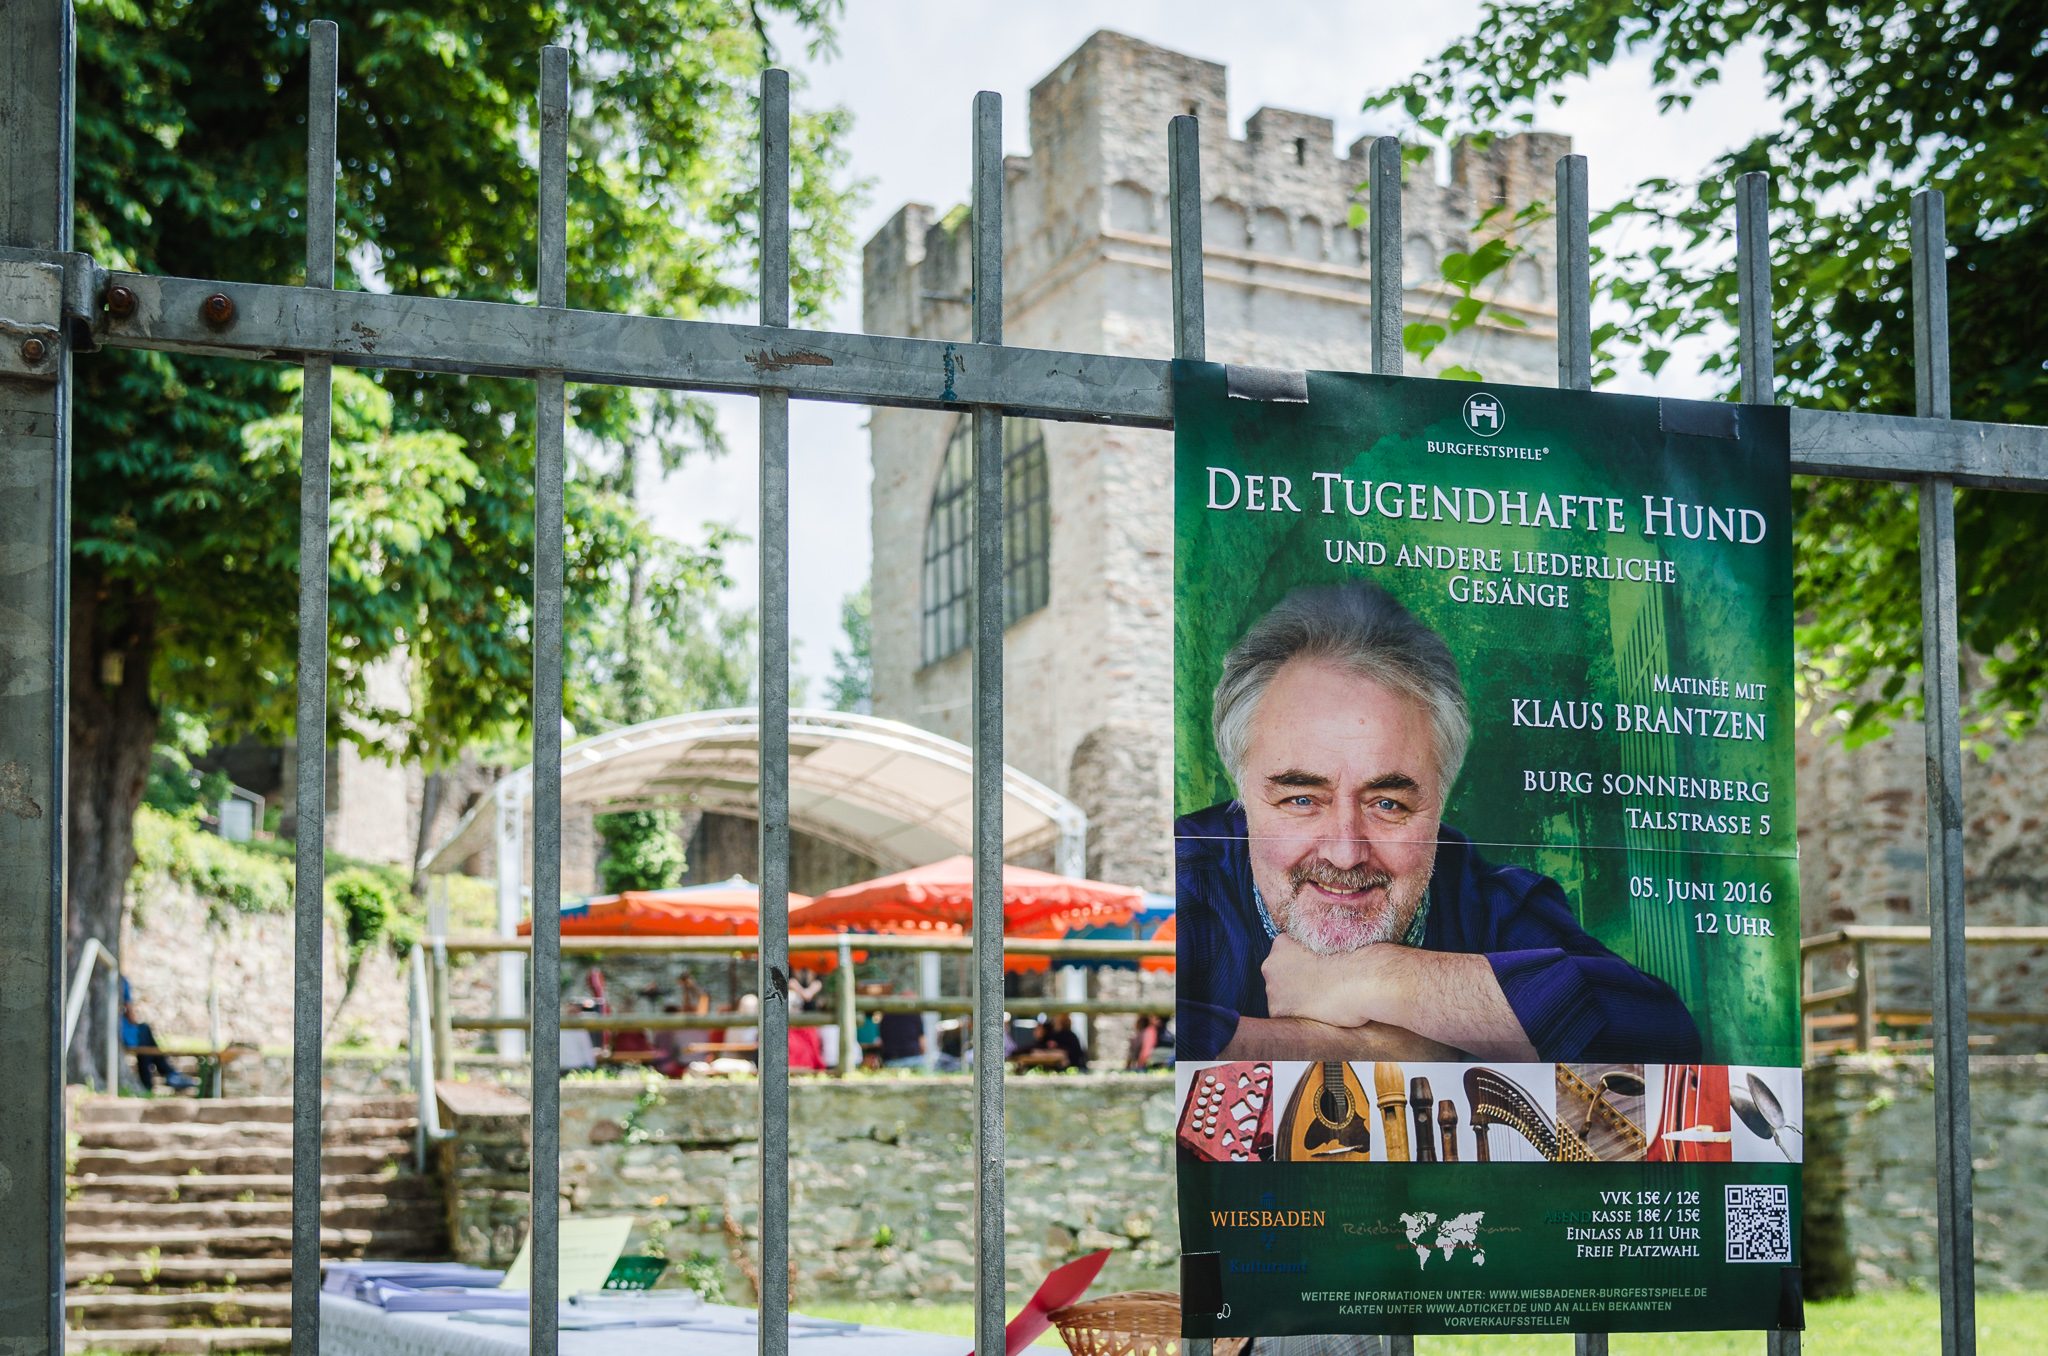 20160605_Wiesbadener_Burgfestspiele_Burg_Sonnenberg-8336.jpg